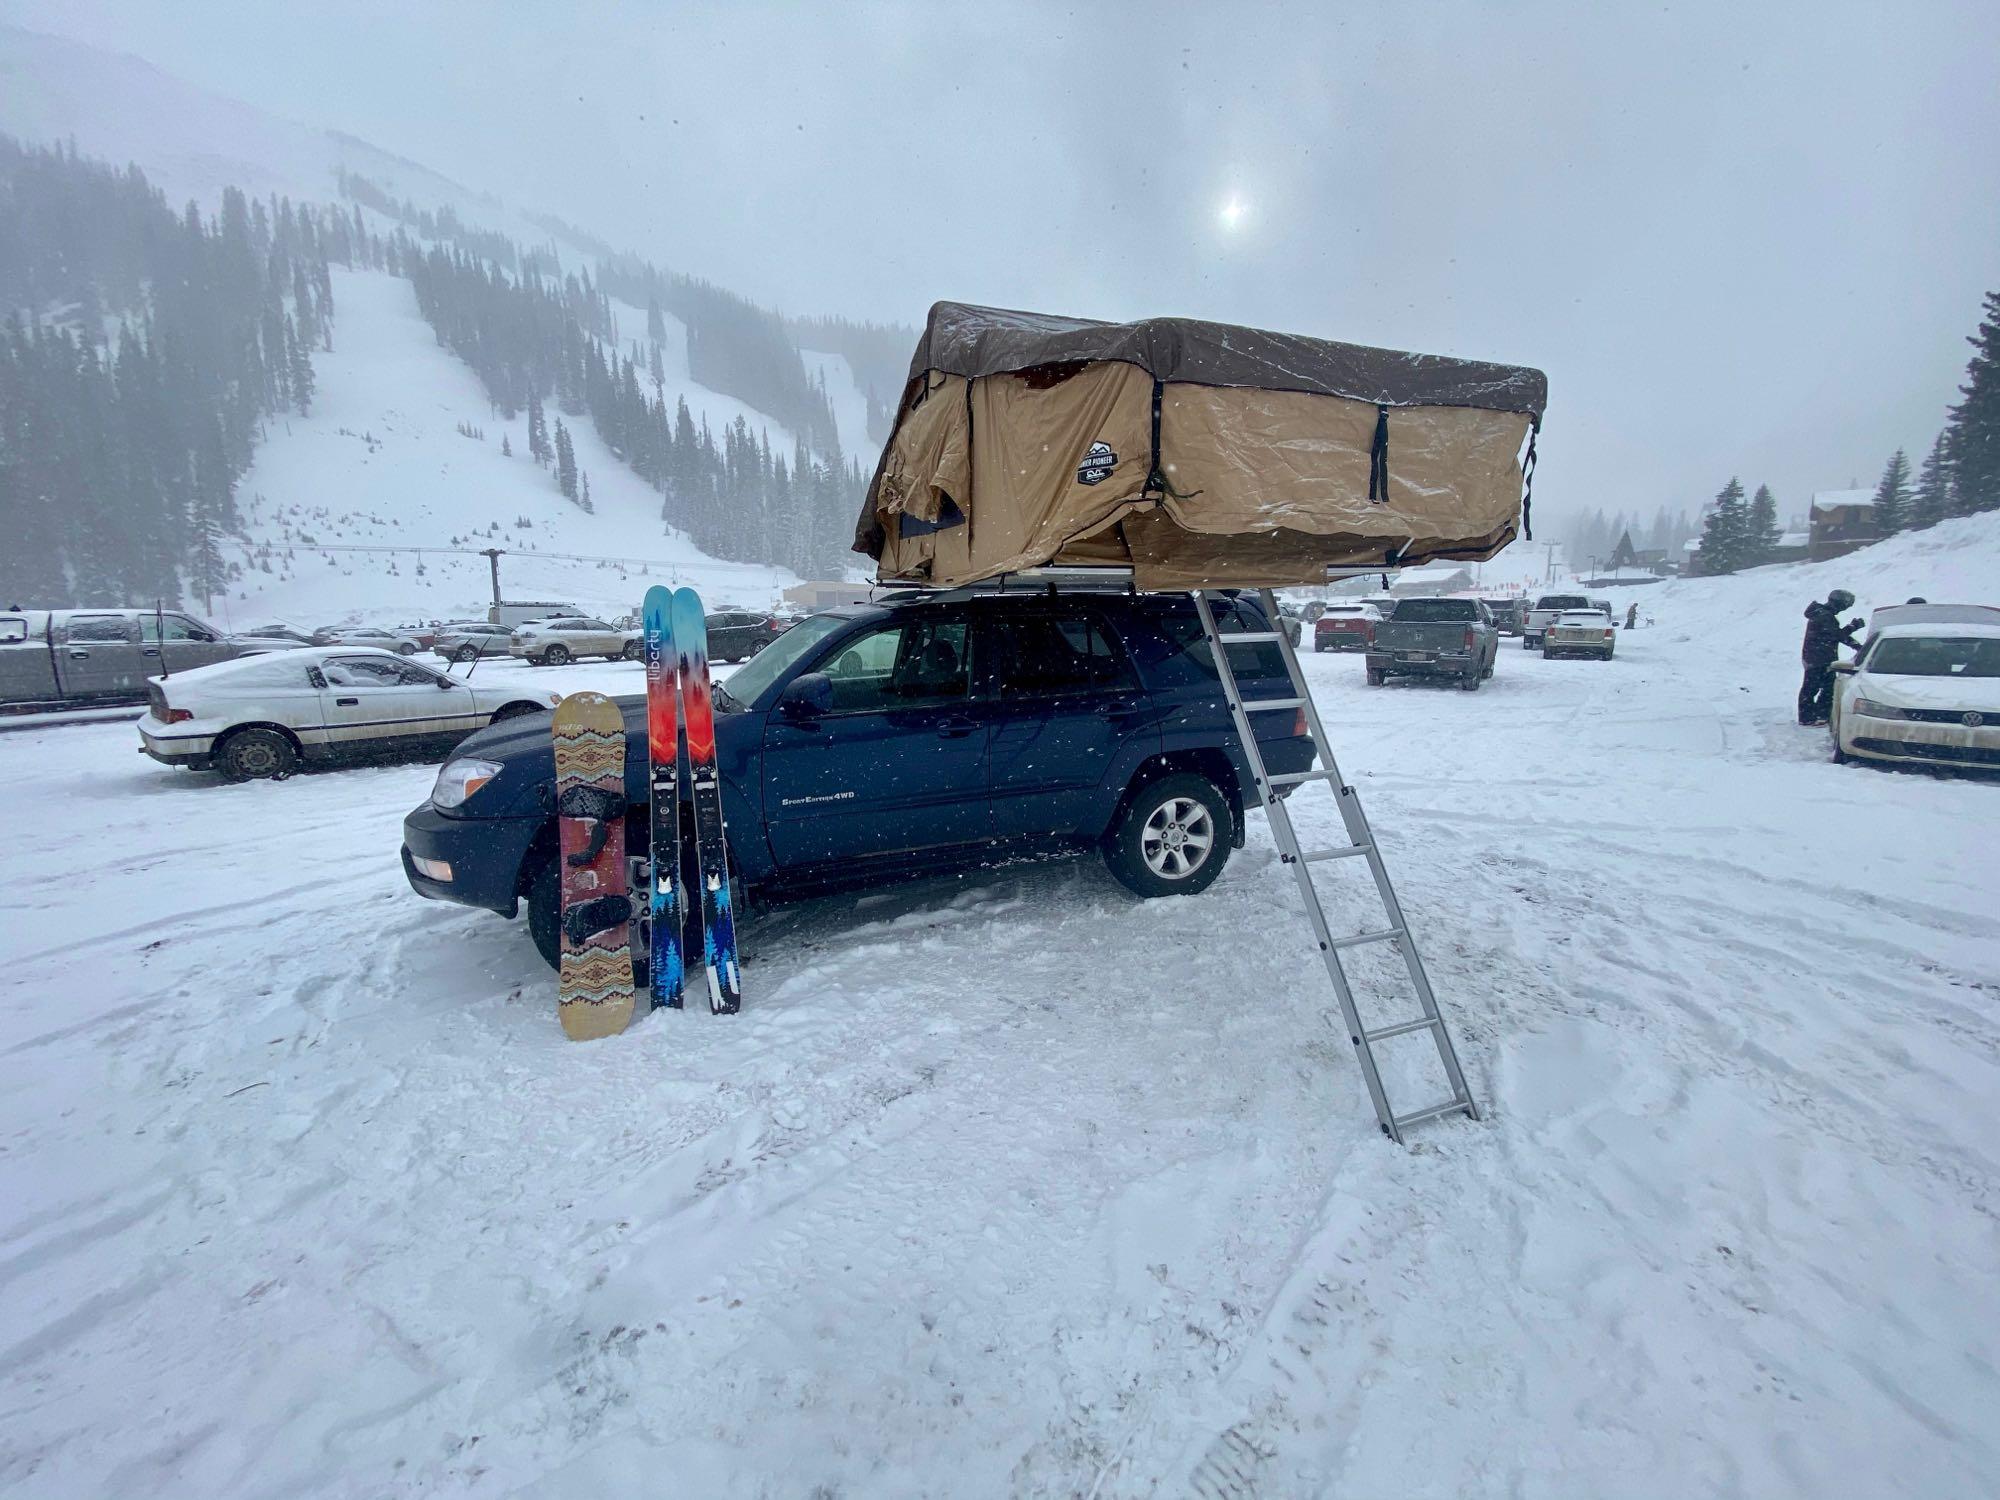 Camping at Loveland Ski Area. Custom Camper 2005